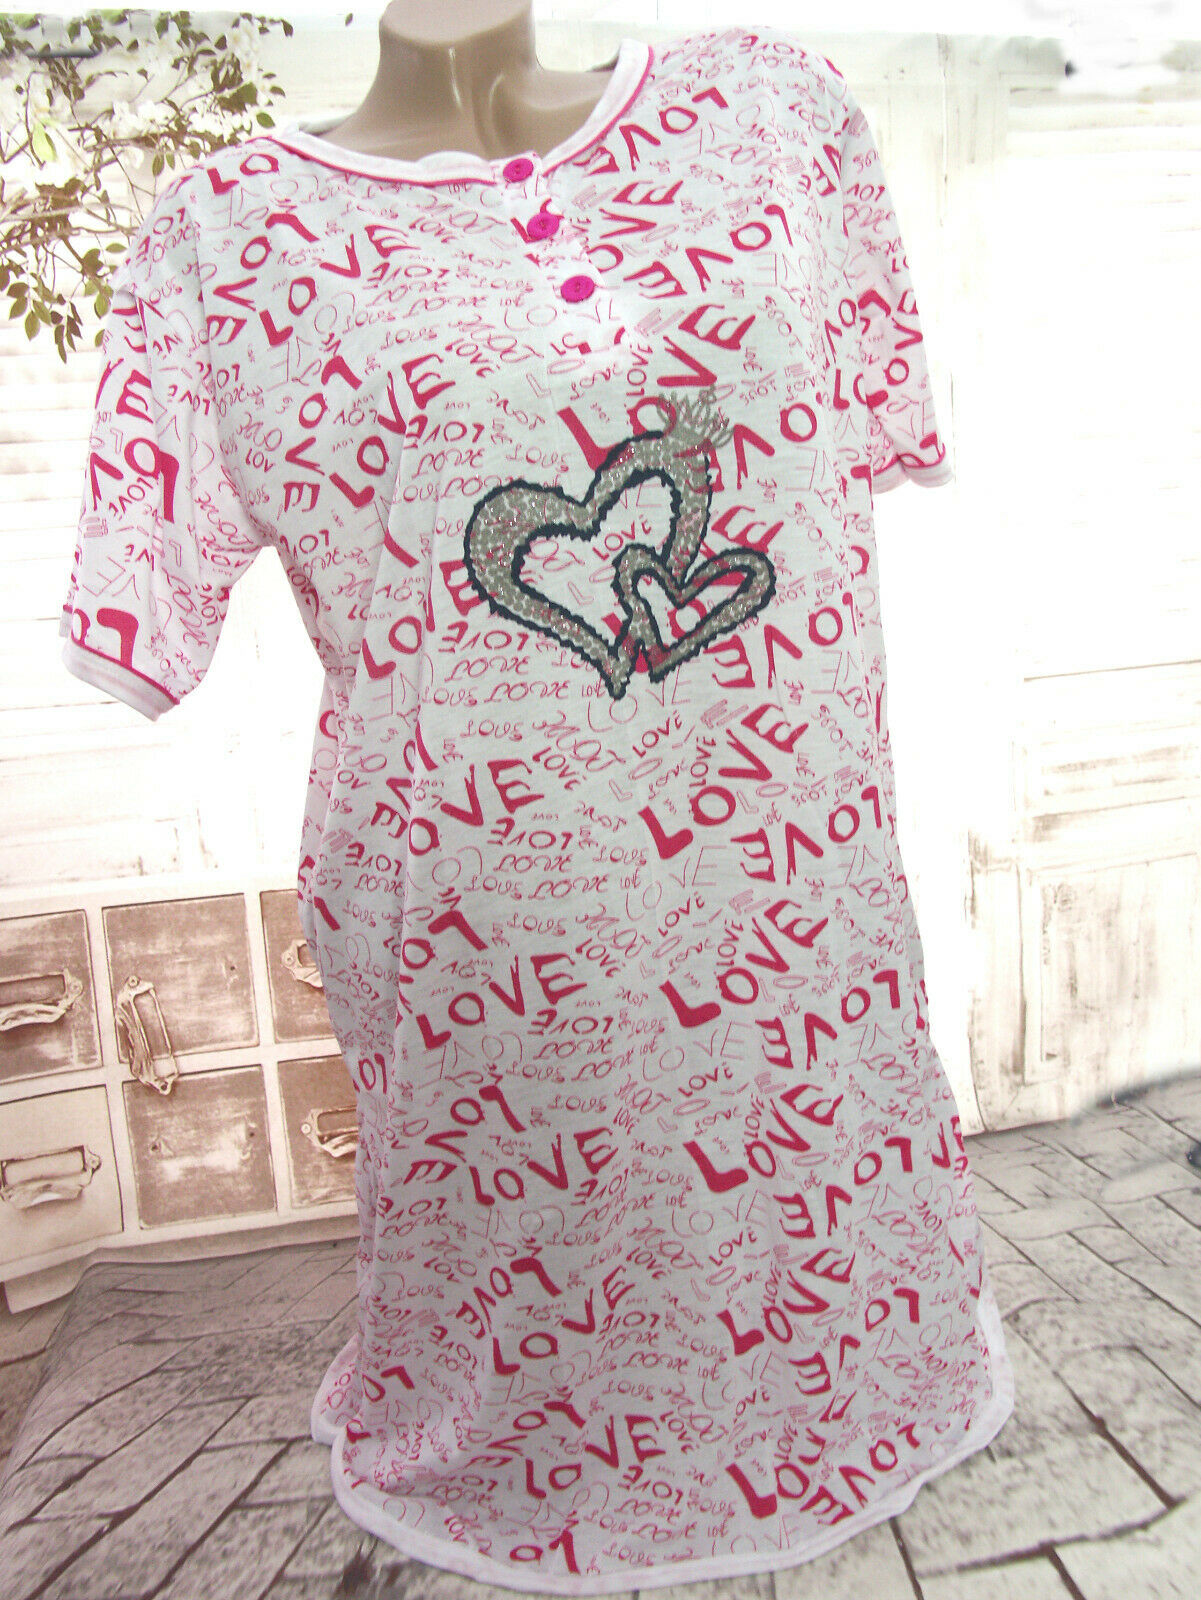 8677e702f957b3 Damen Kurzarm NACHTHEMD Nachtwäsche Schlafshirt Pyjama LOVE HERZEN  Weiß/Pink Neu*